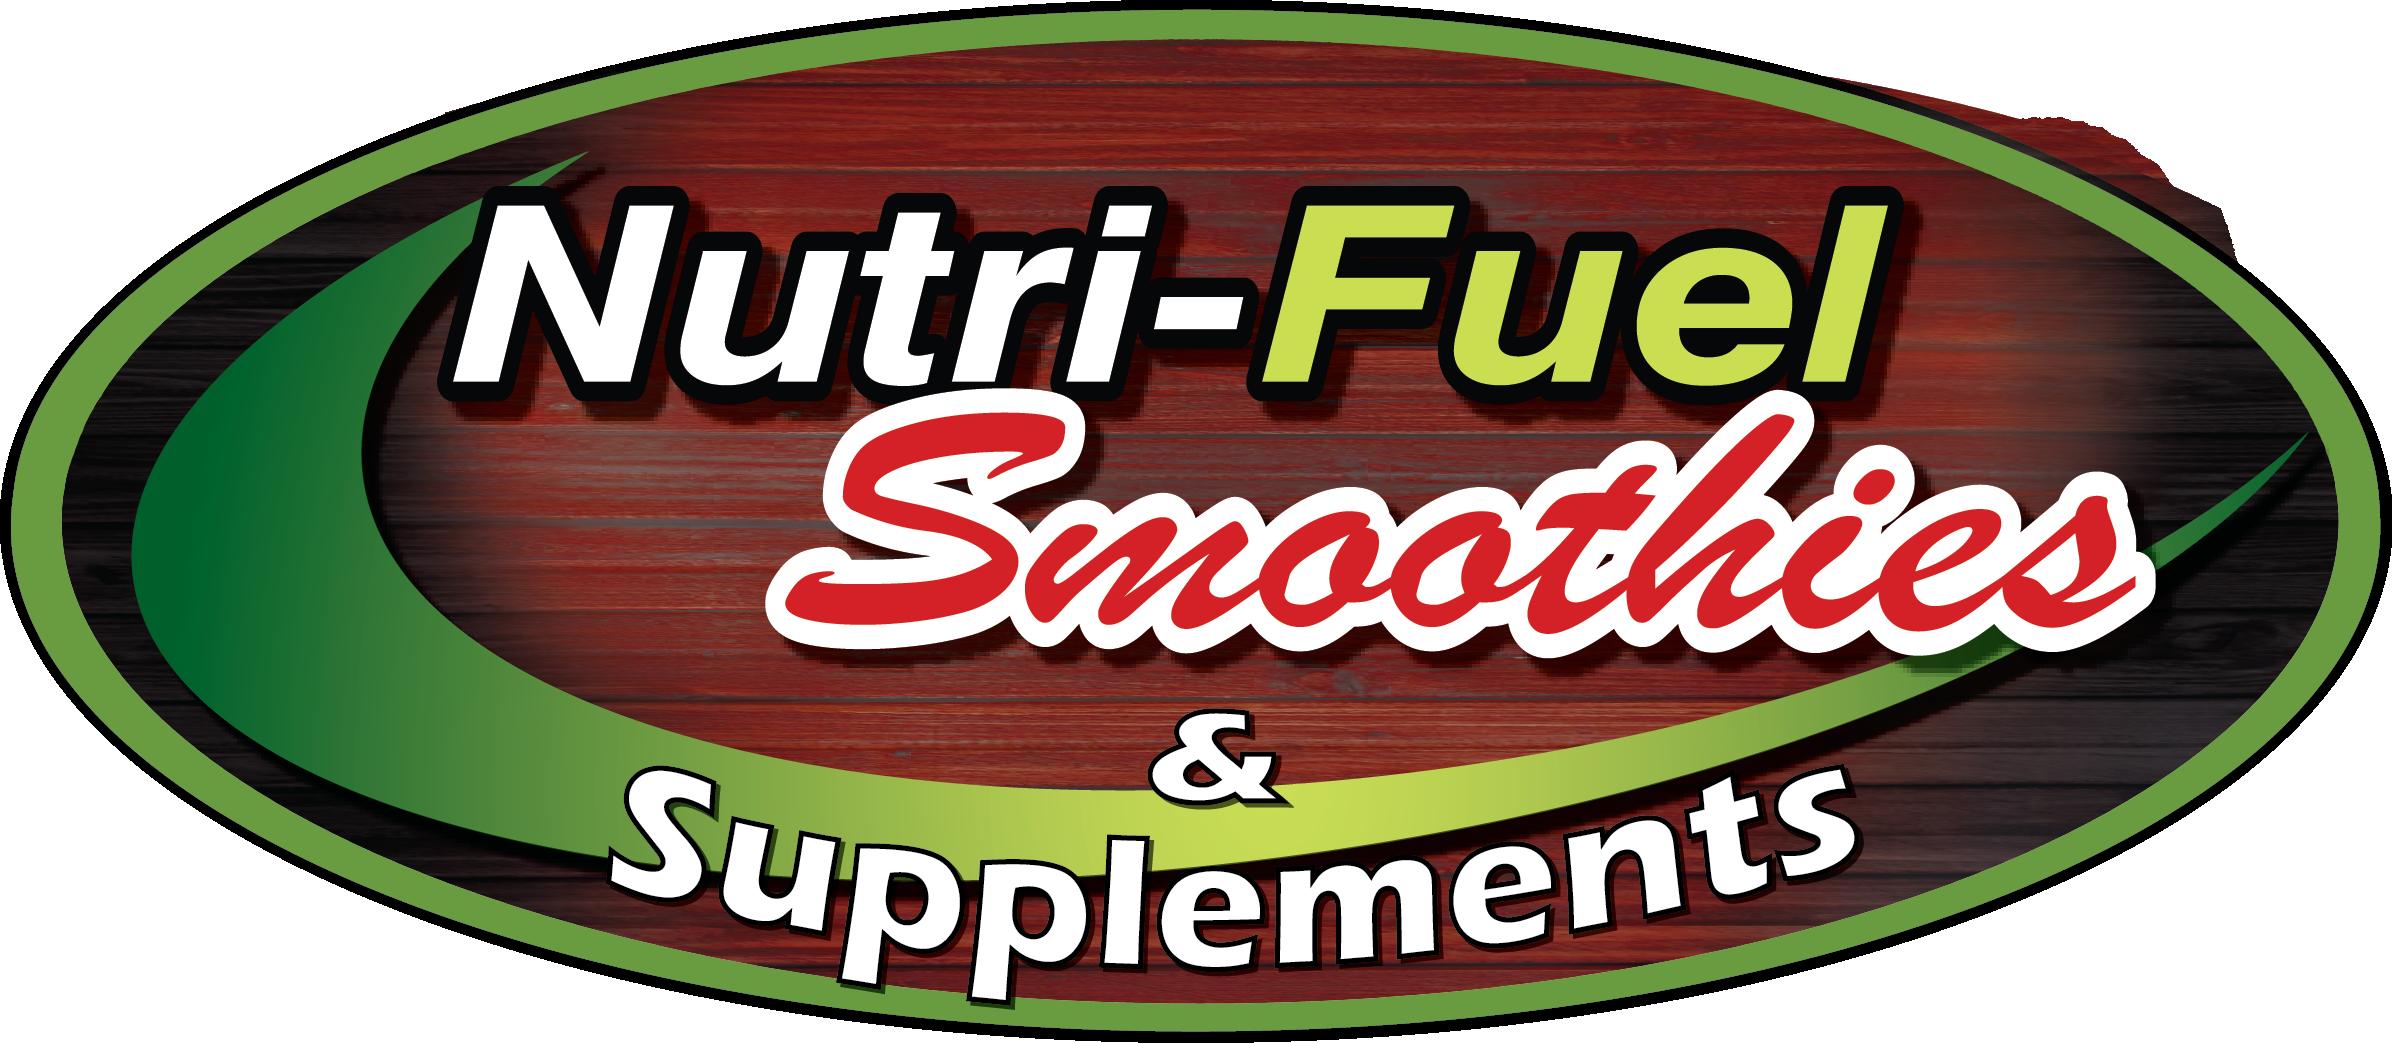 Nutri-Fuel Smoothies